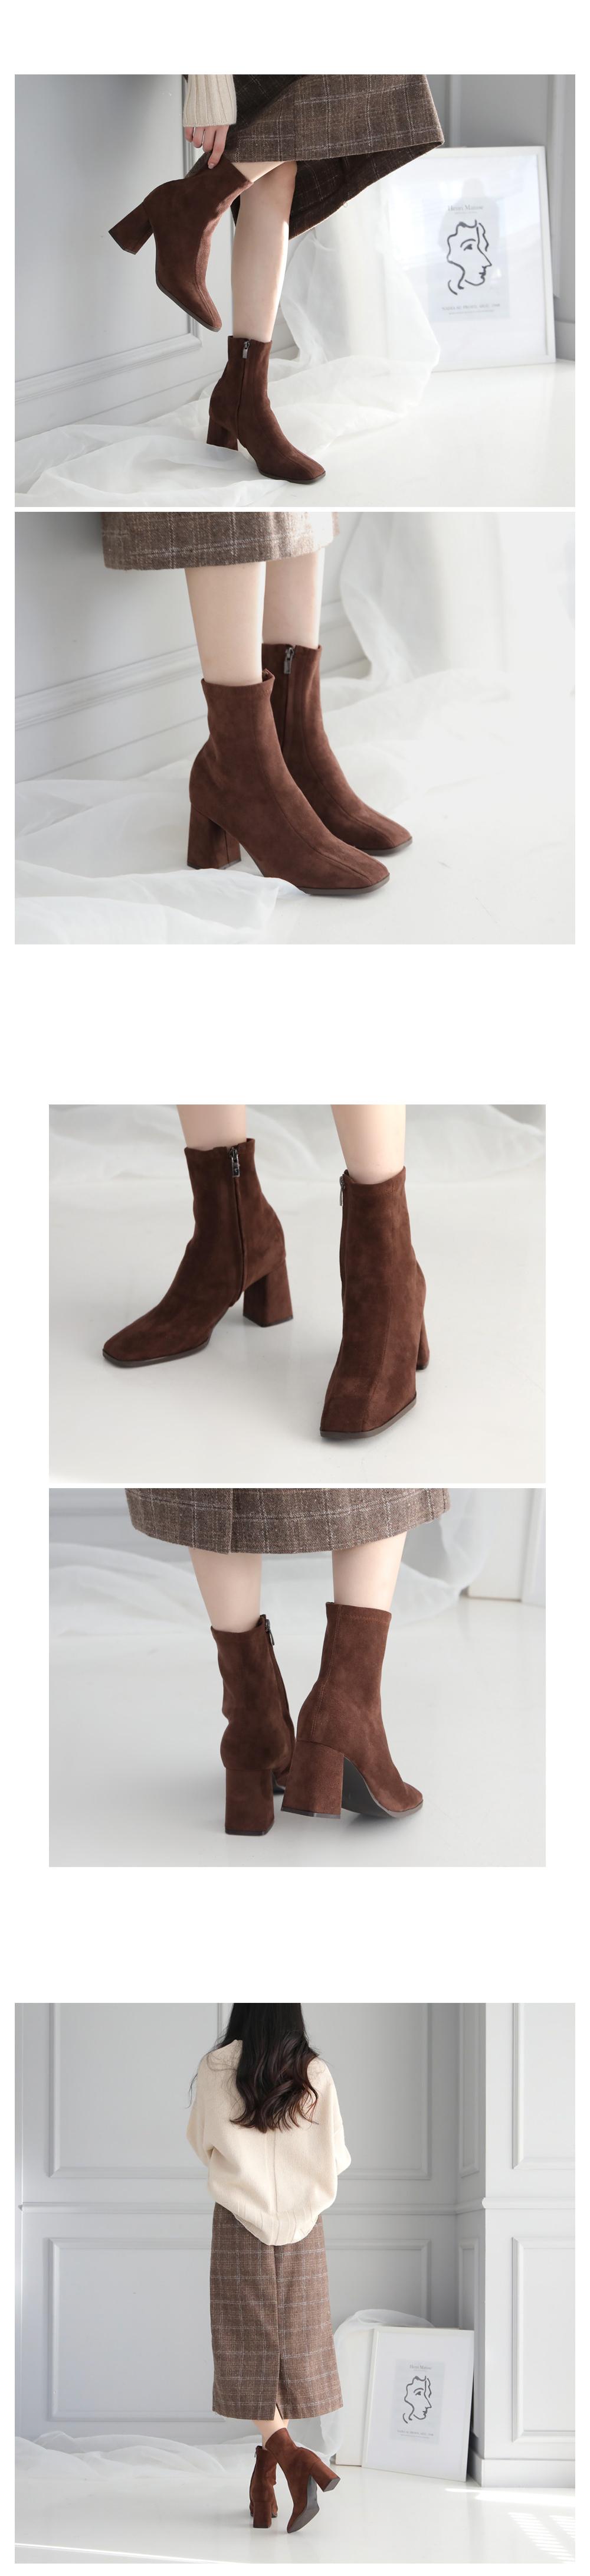 Gevens Sachs Ankle Boots 7.5cm